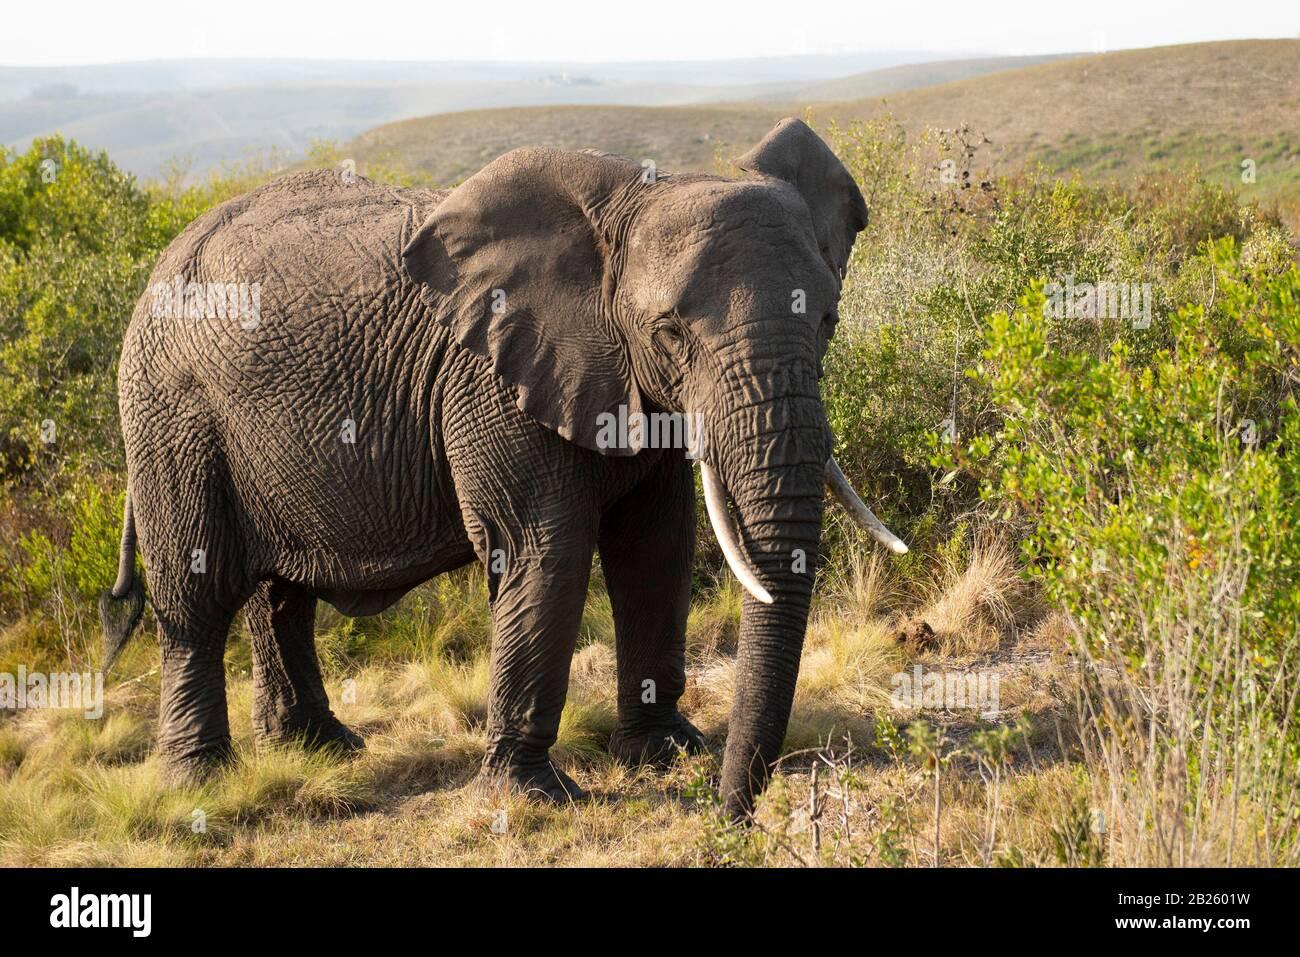 El elefante africano, Loxodonta africana africana, Gondwana Game Reserve, Sudáfrica Foto de stock